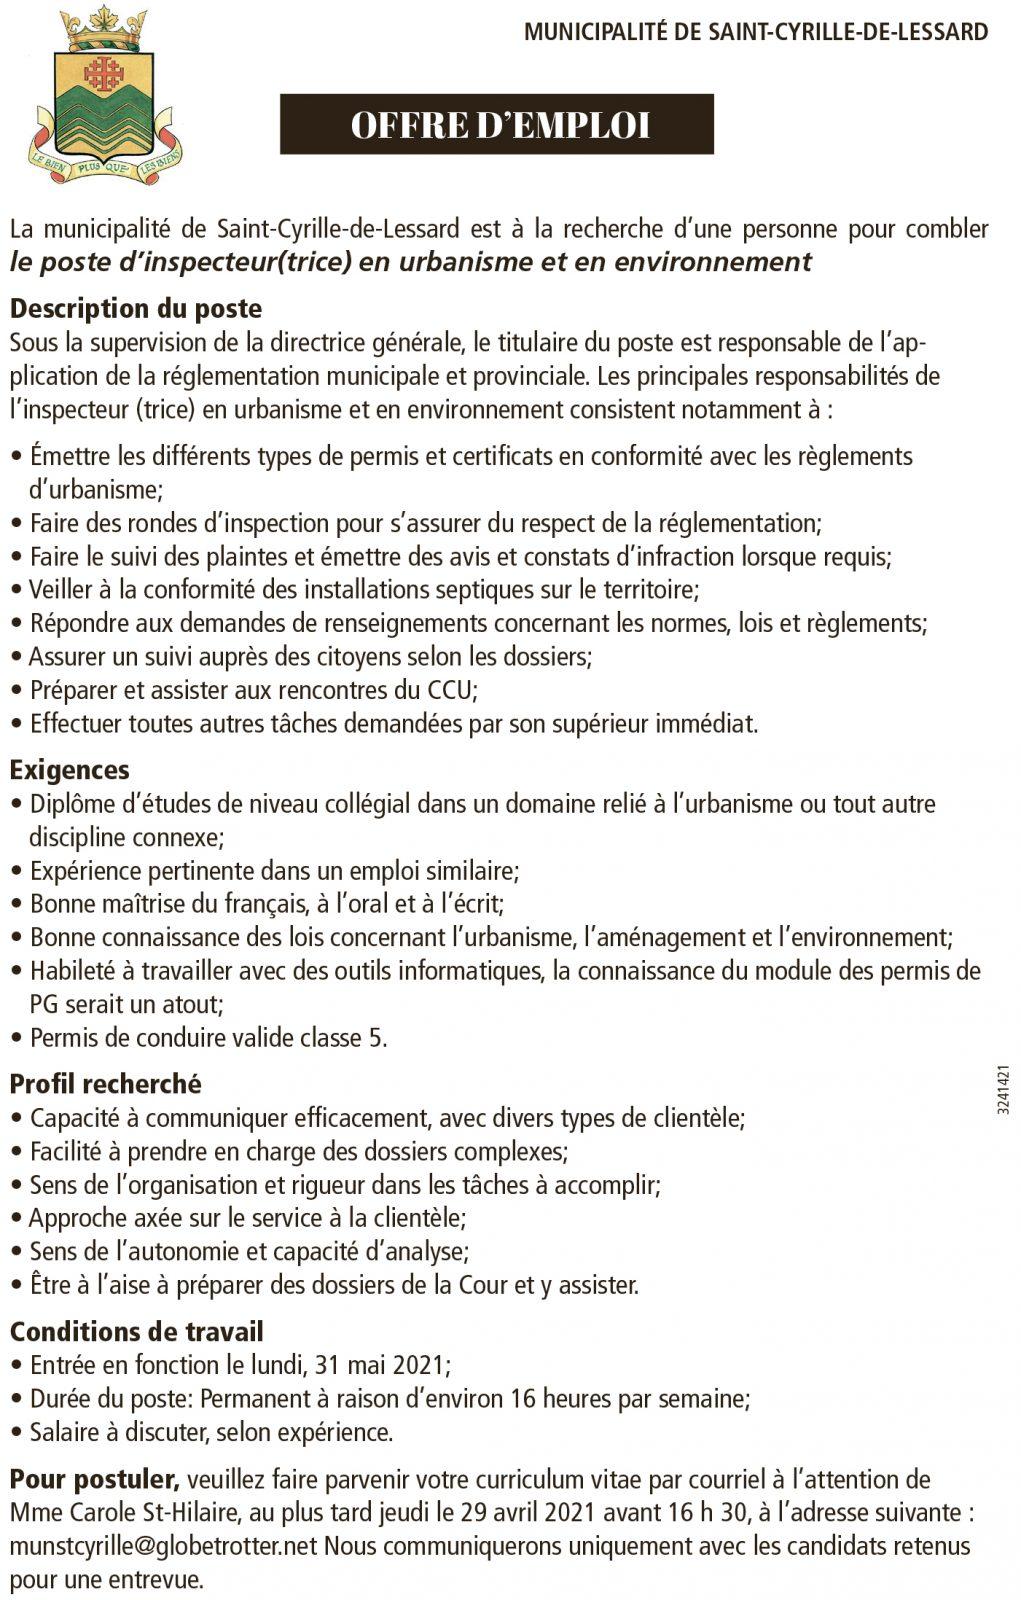 Inspecteur / Inspectrice en urbanisme et en environnement